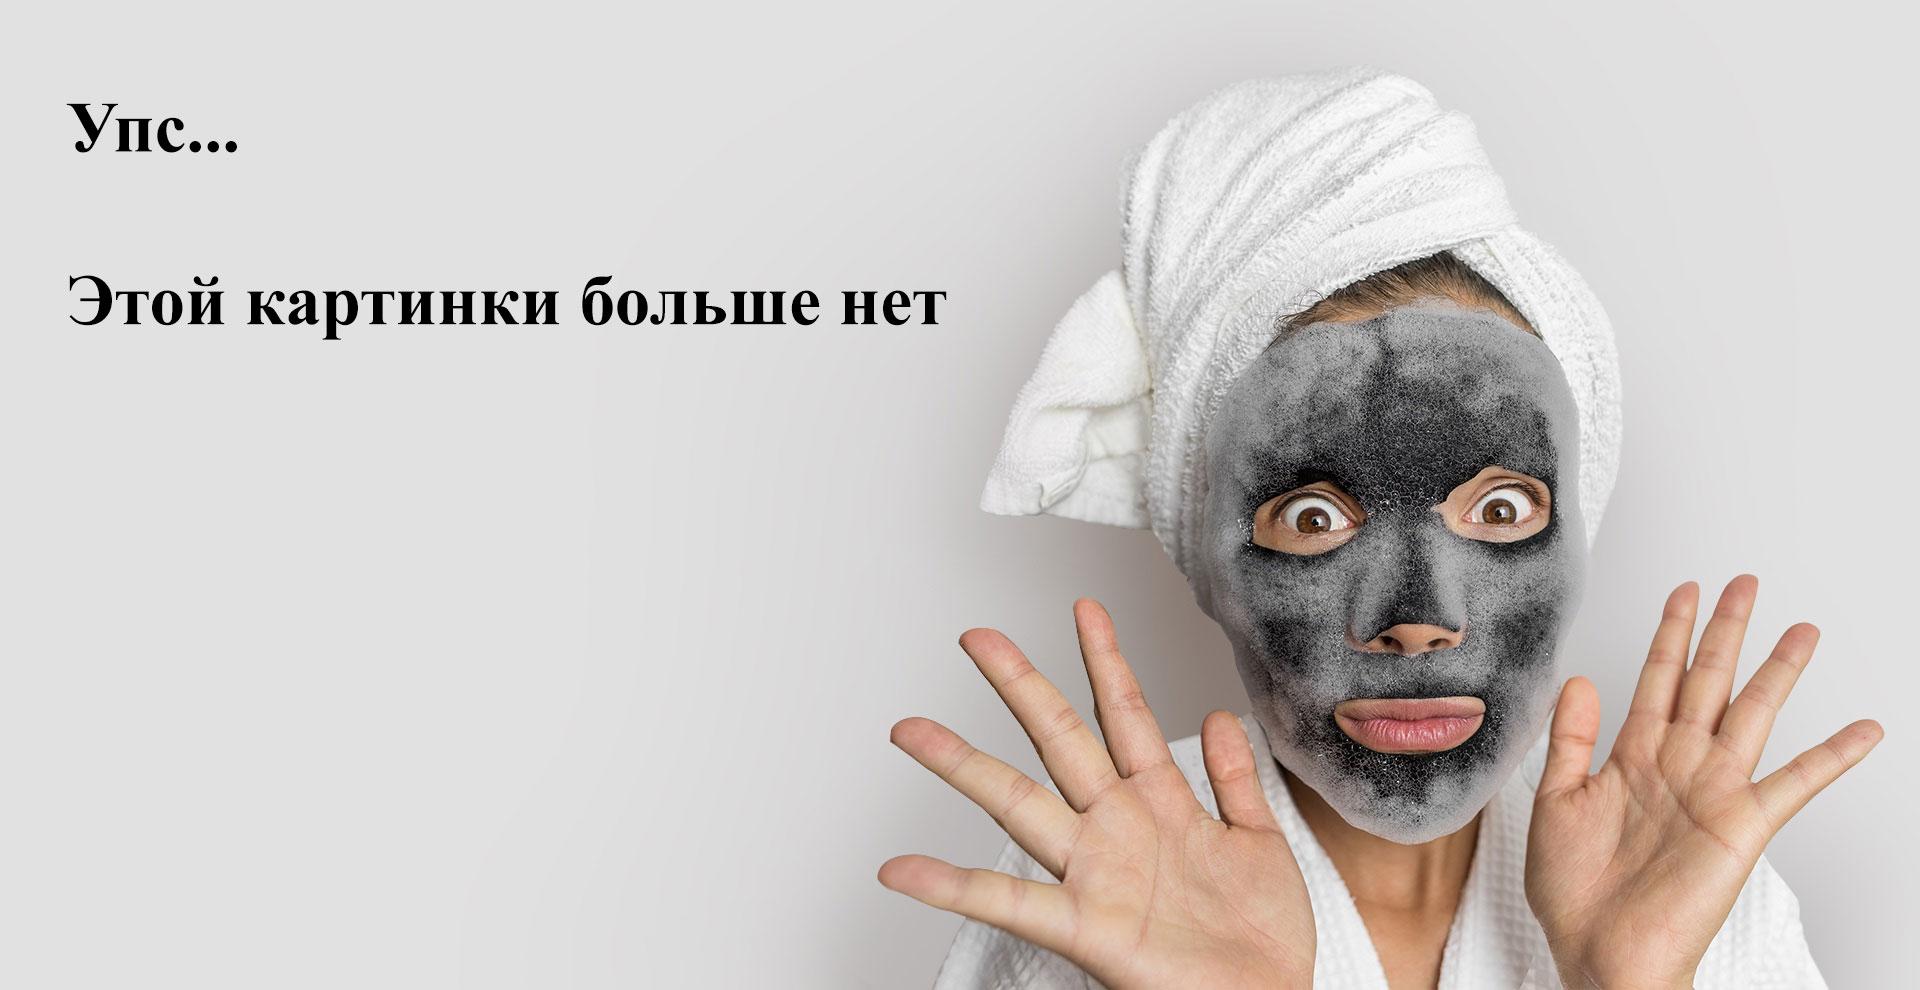 Vivienne Sabo, Губная помада Merci, тон 04